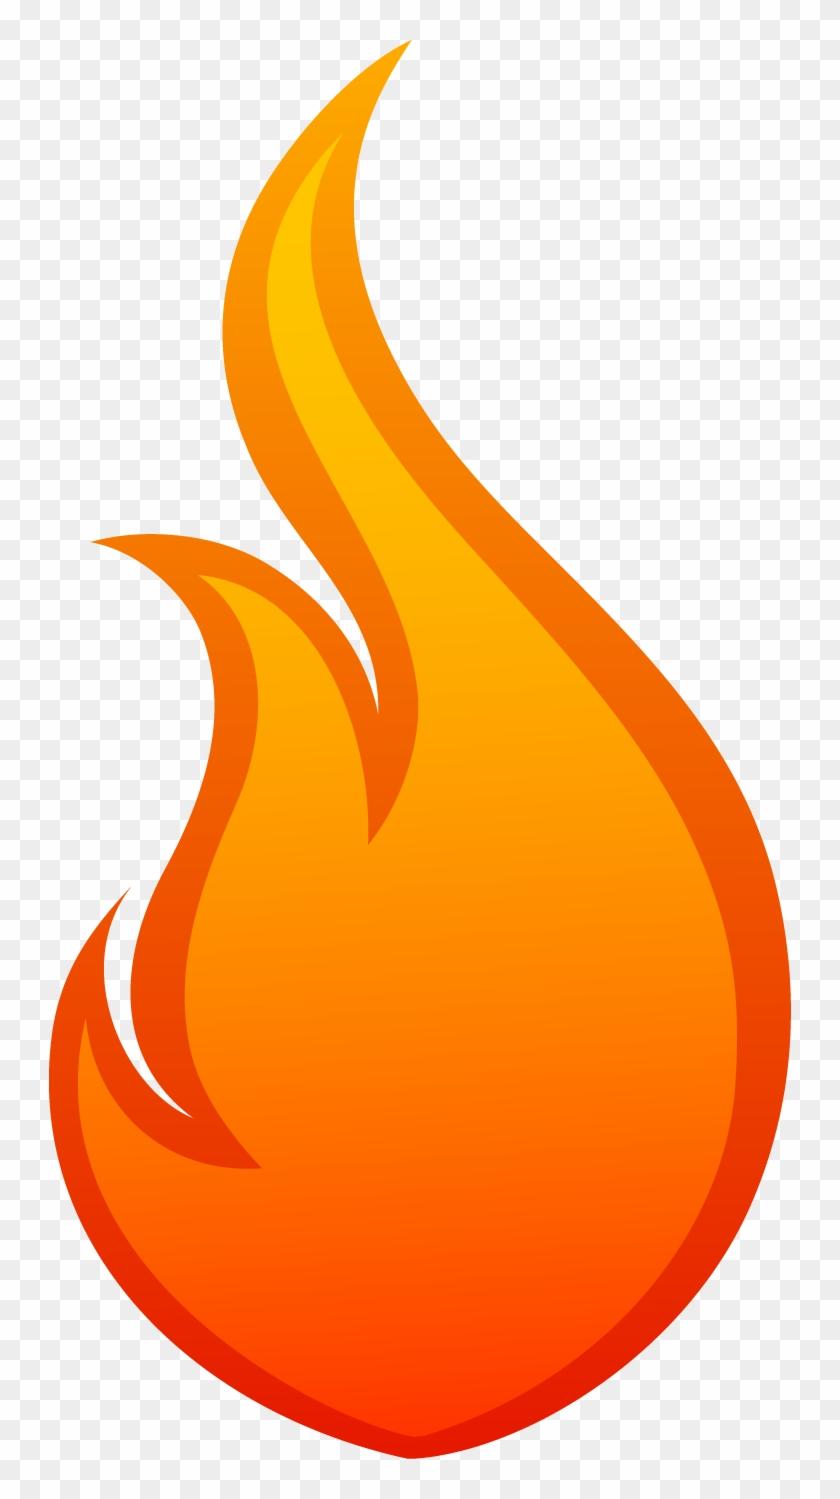 Abstract, Black, Blaze, Blazing, Bonfire, Burn, Campfire, - Euclidean Vector #14525